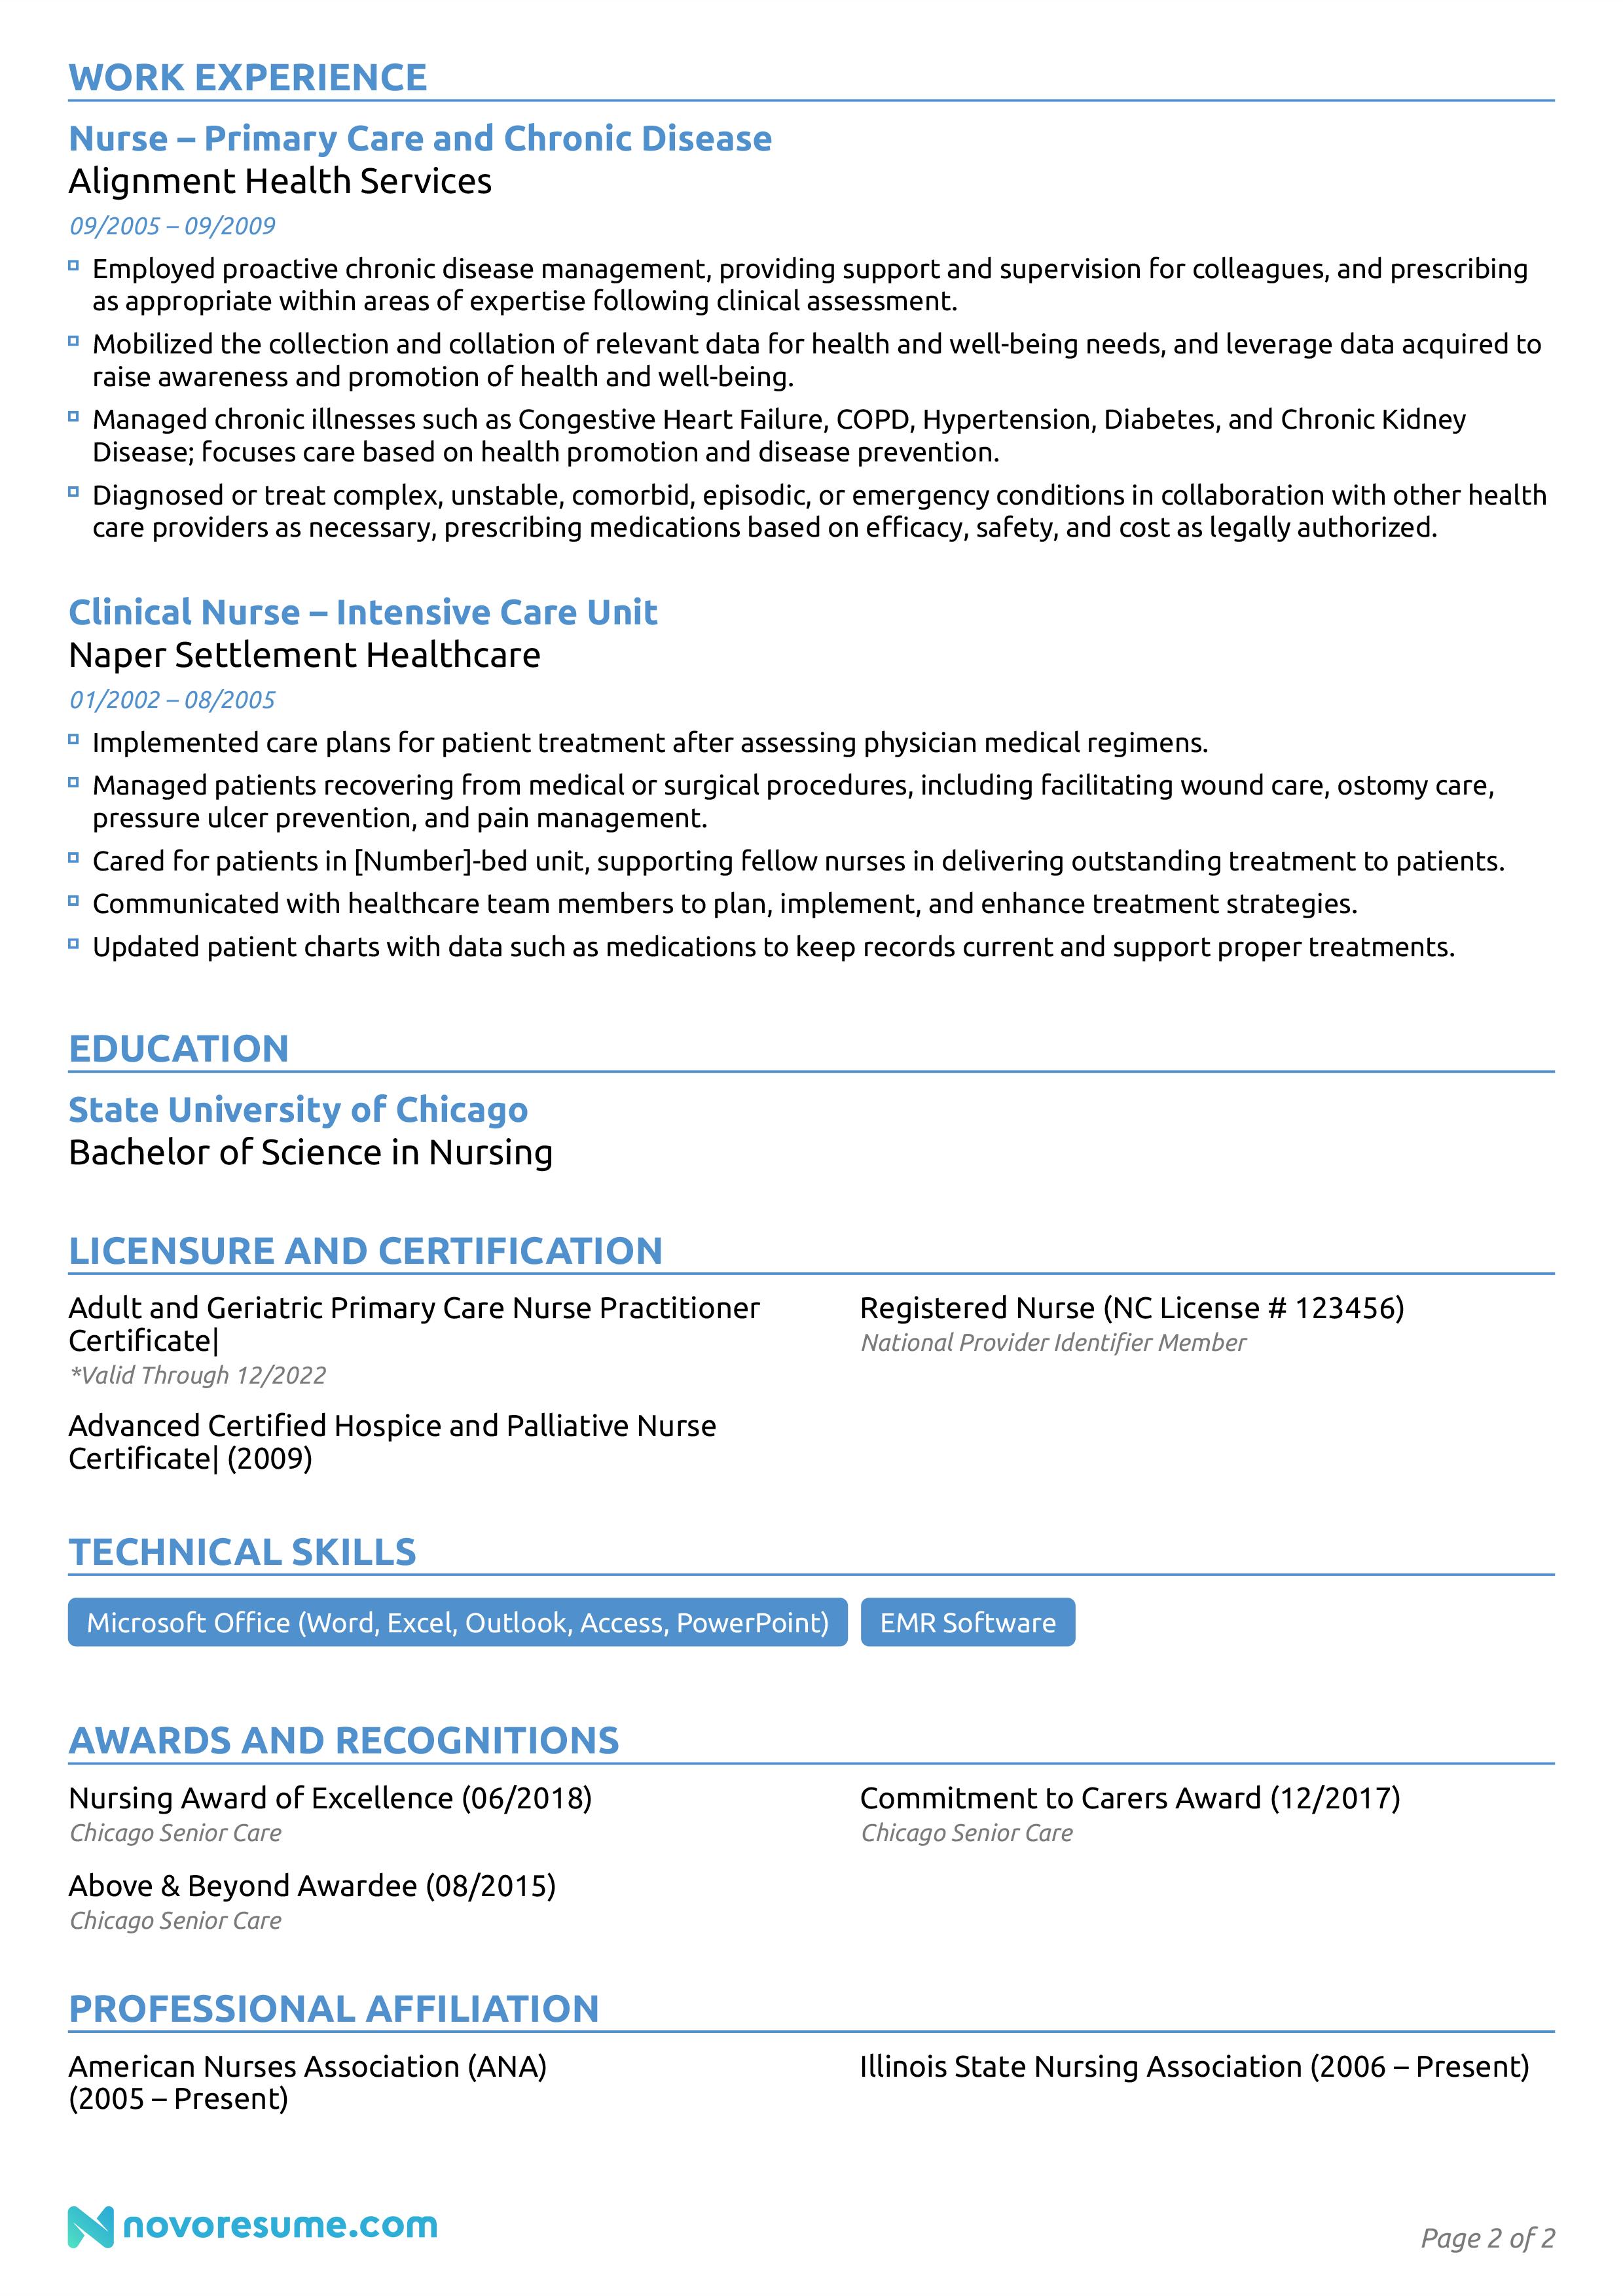 registered nurse resume example page 2